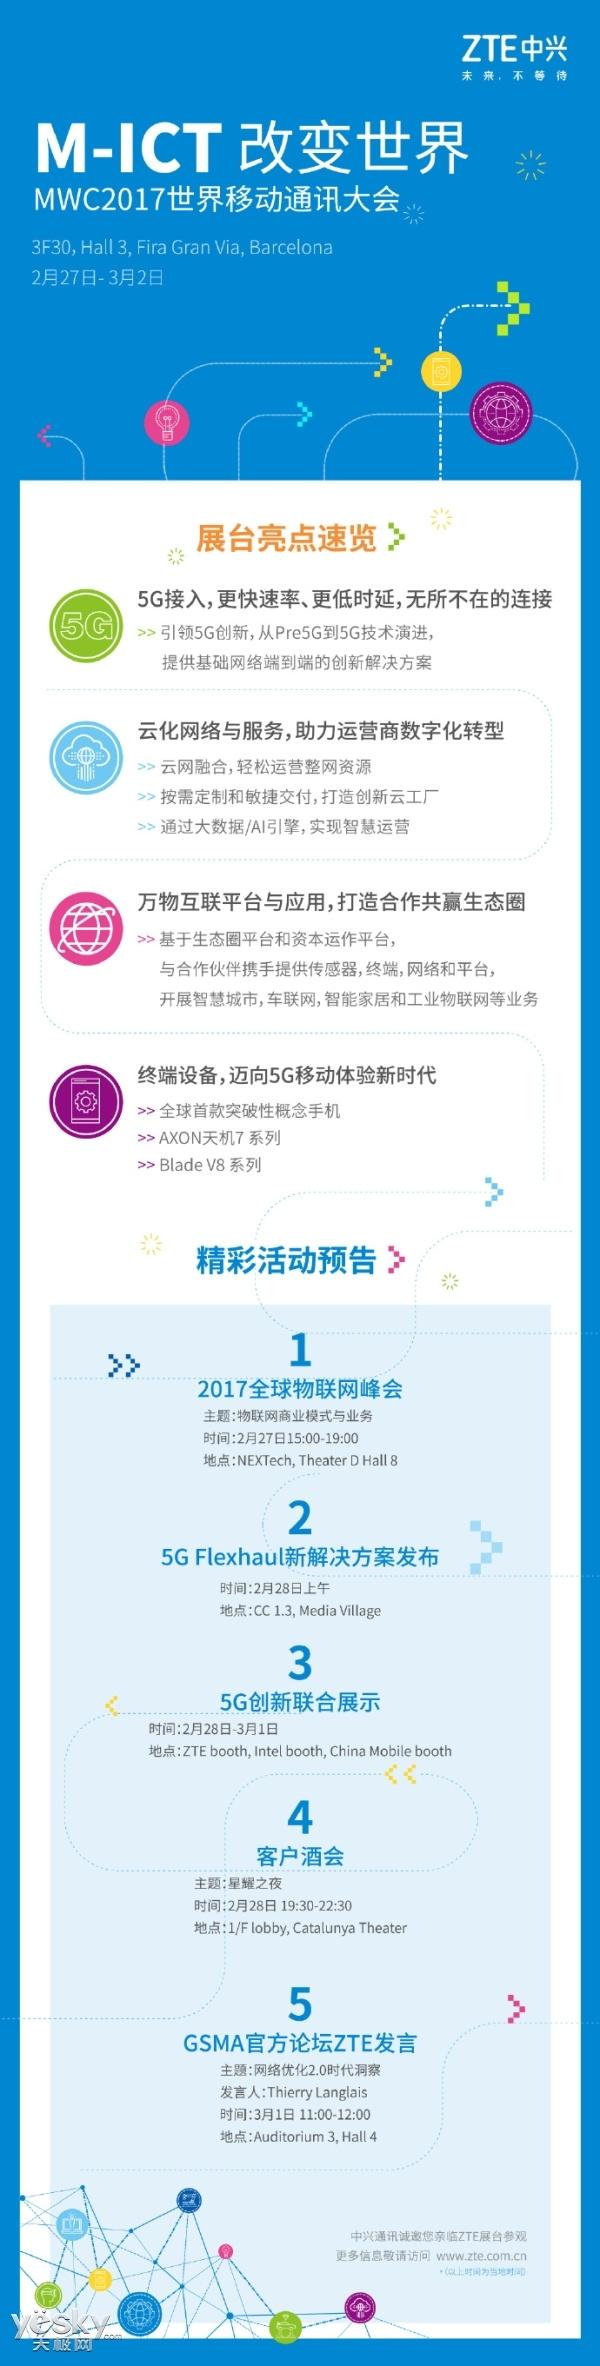 MWC:中兴将推ZTE GigabitPhone 支持千兆LTE